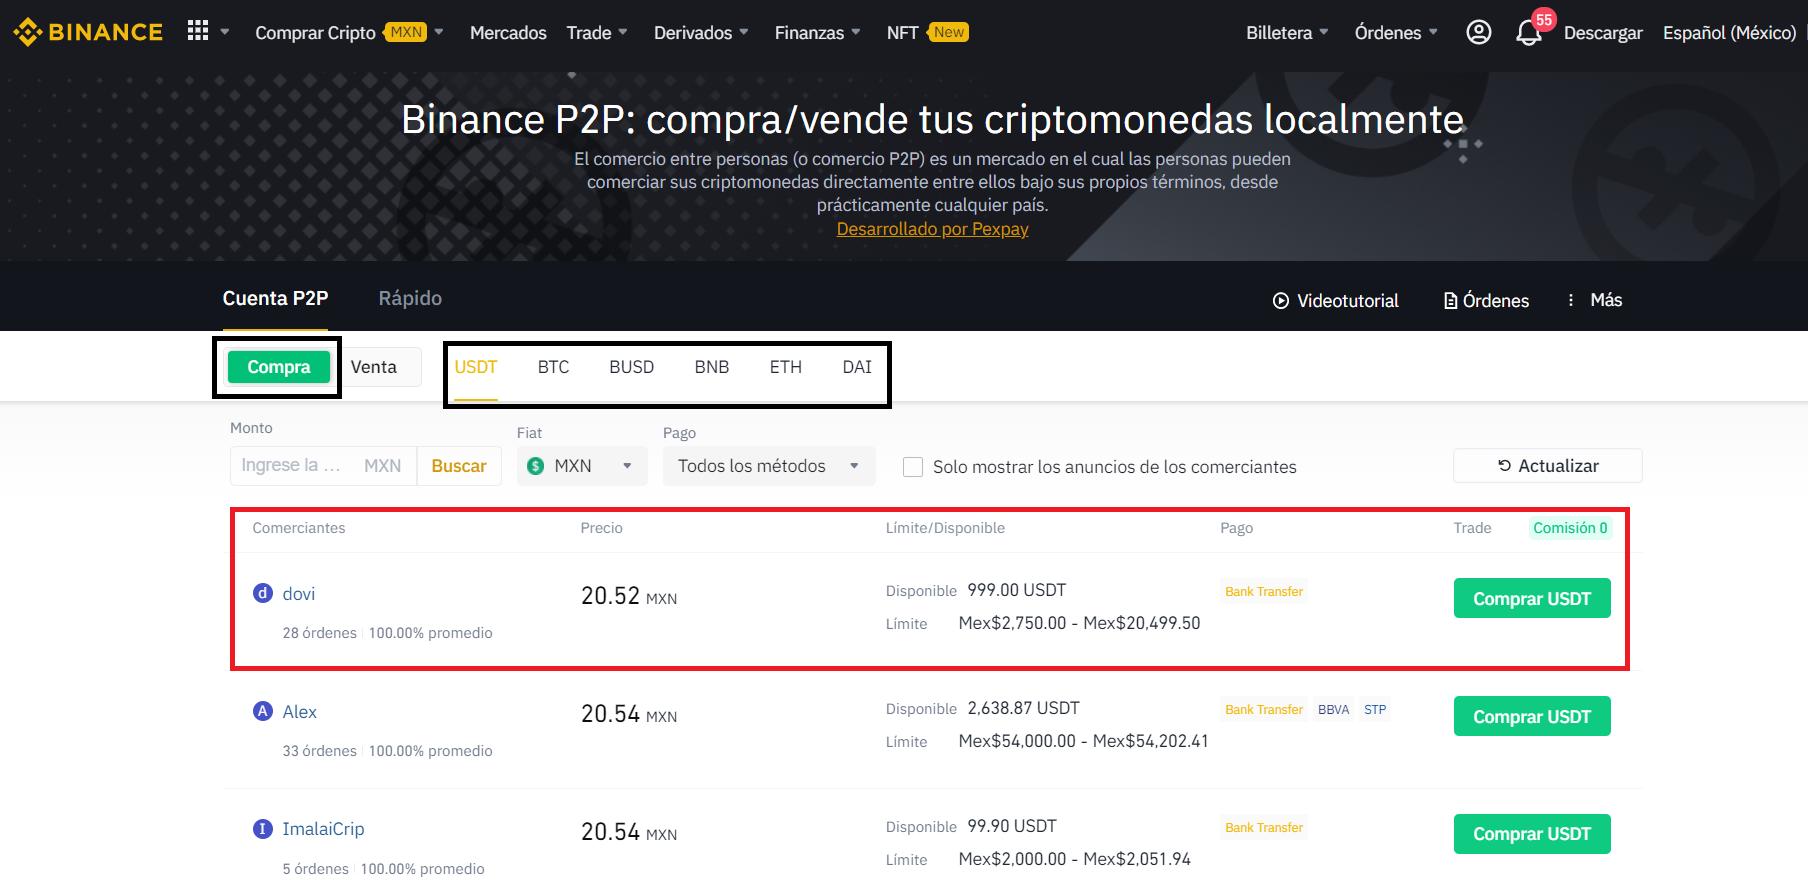 Binance P2P market for Mexico.